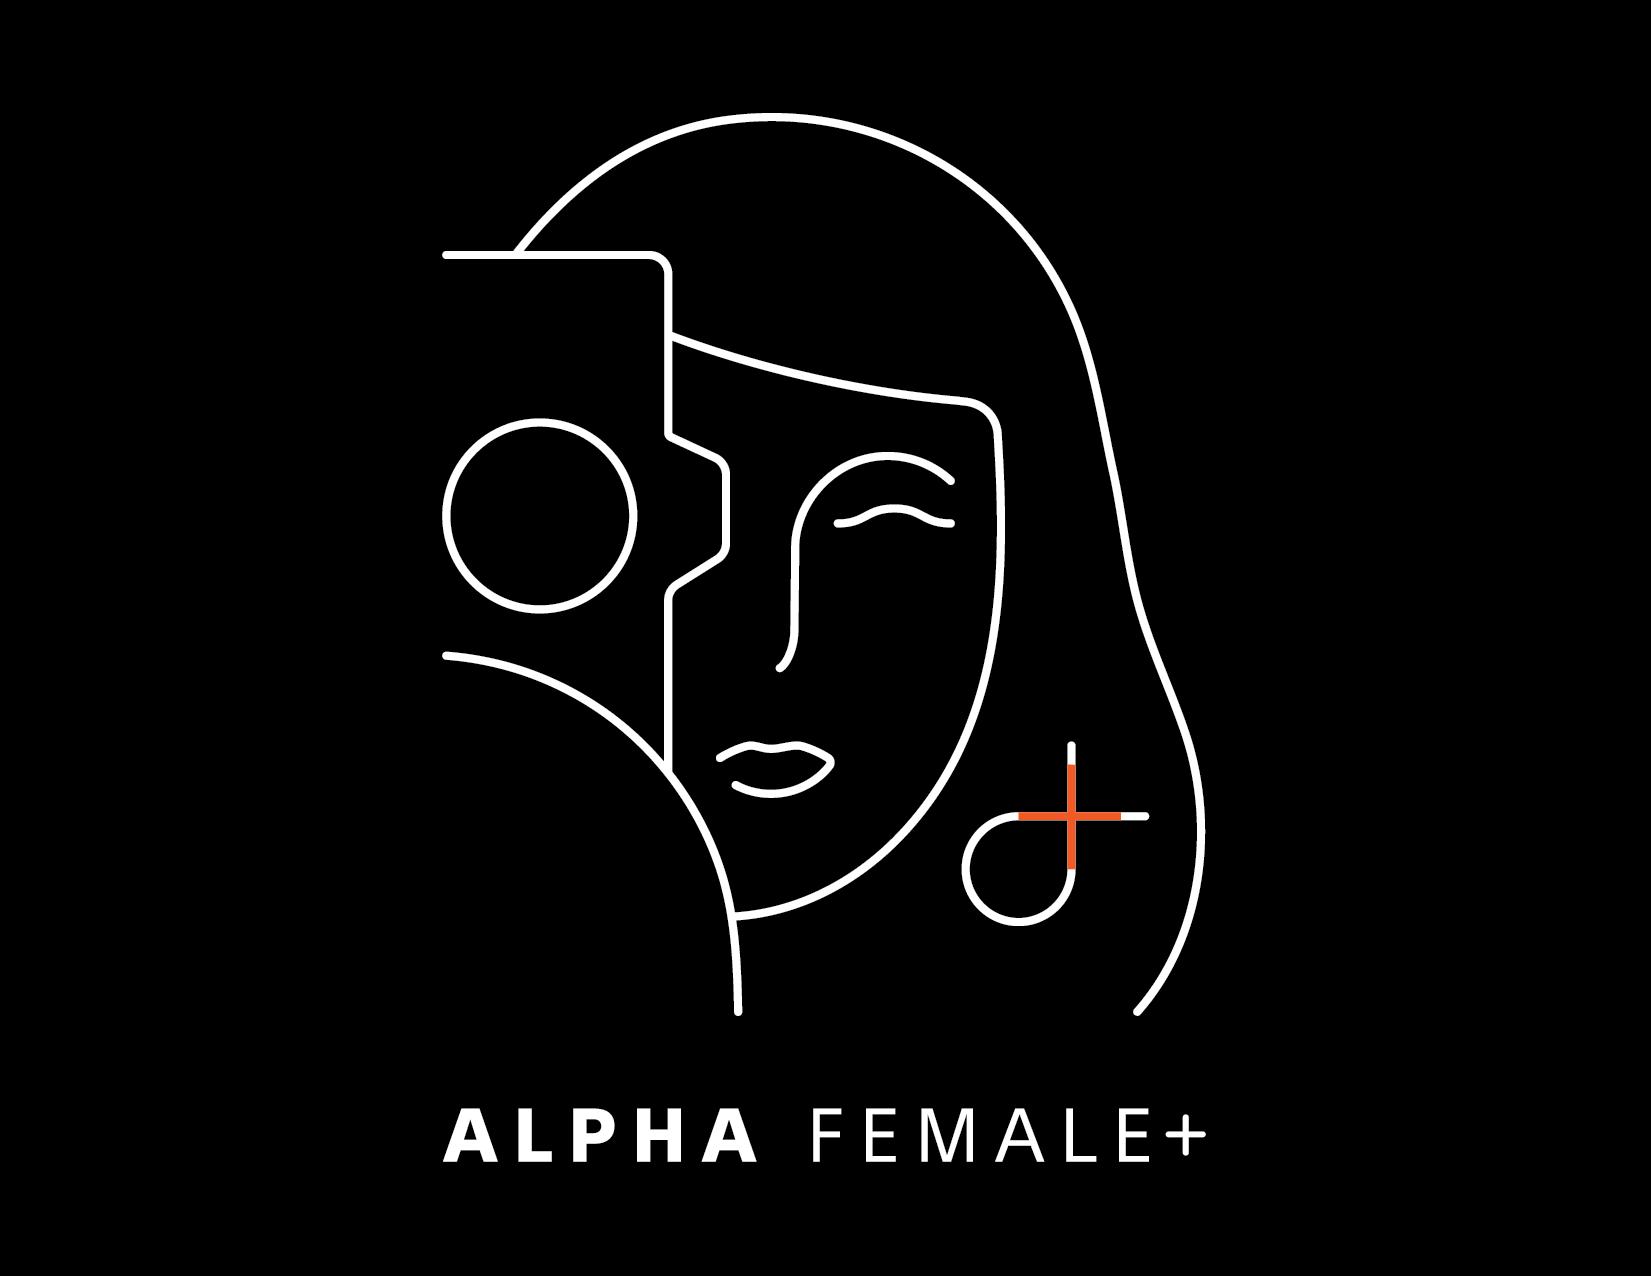 Sony Alpha Female+ Grant Program